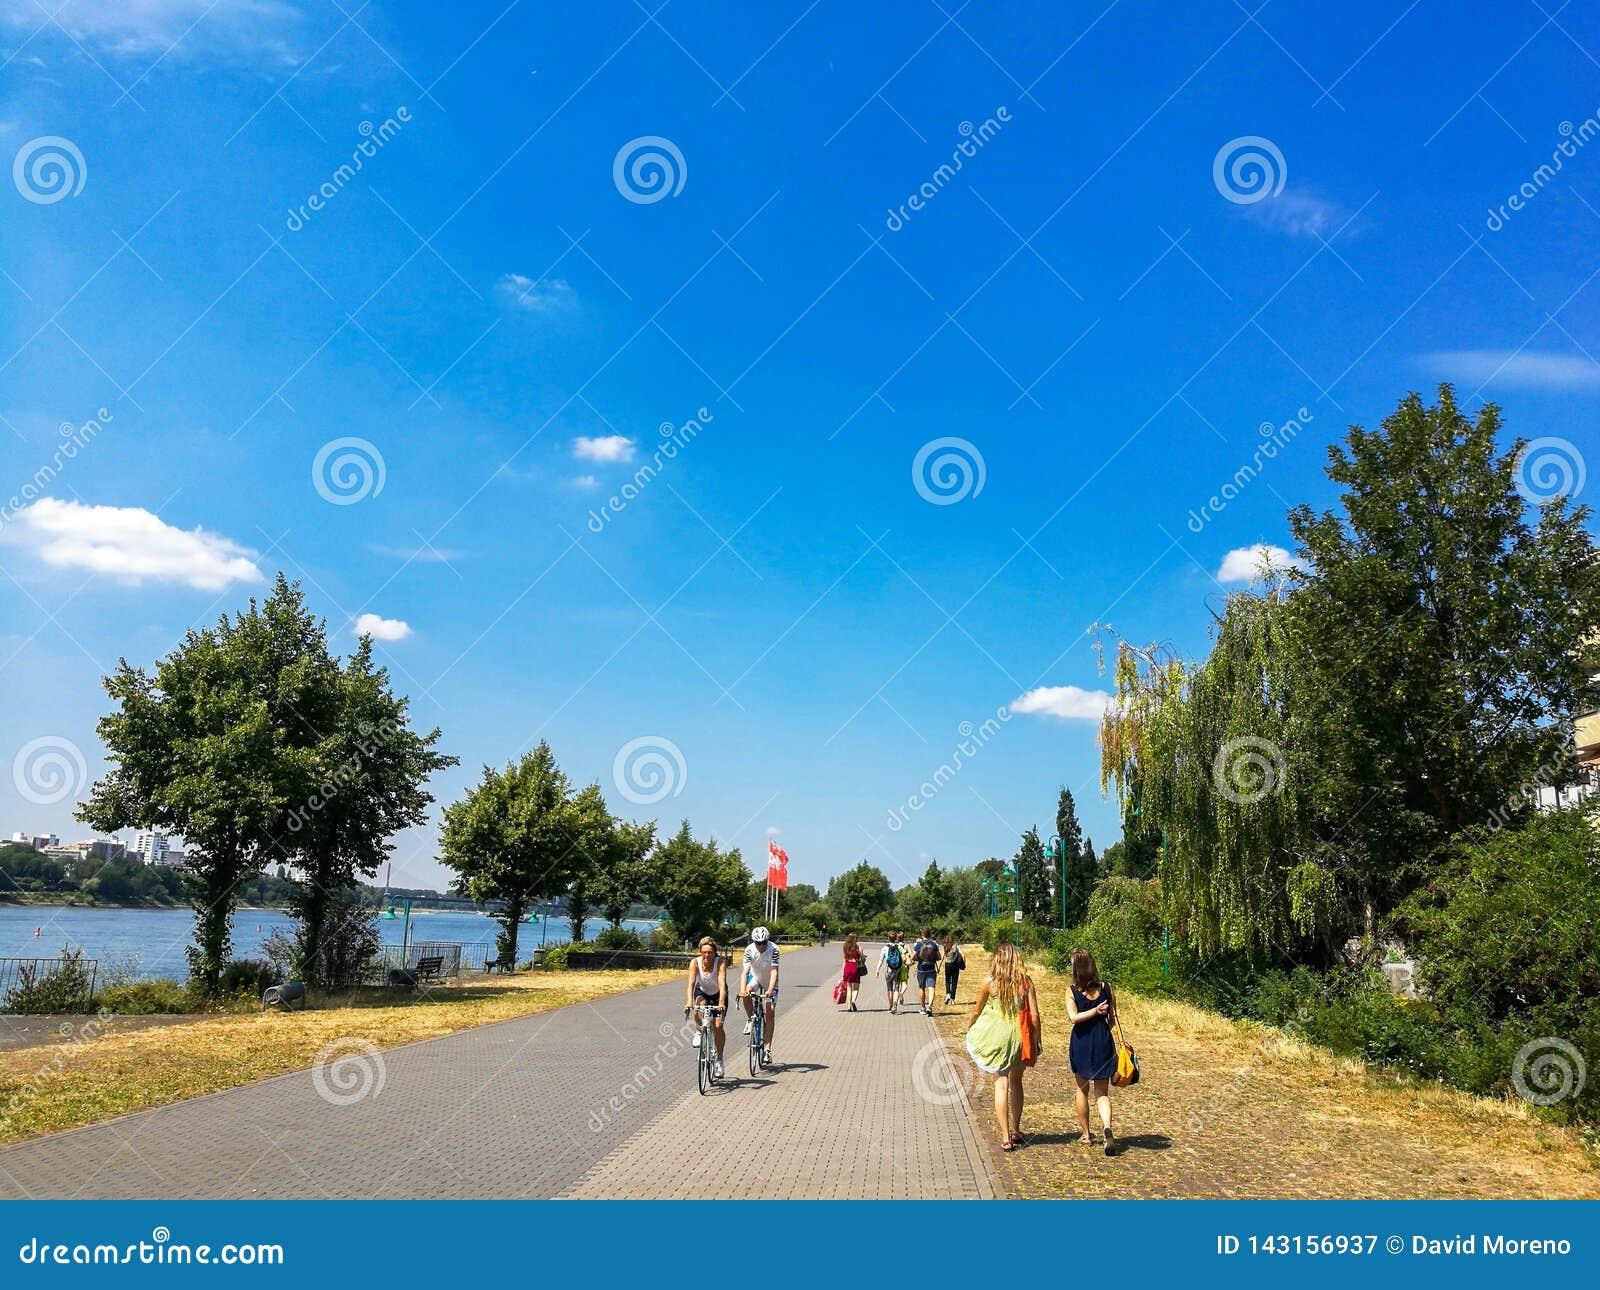 BONN - 13 juli: mensen in het park in Bonn, Duitsland die langs de Rijn-rivier lopen